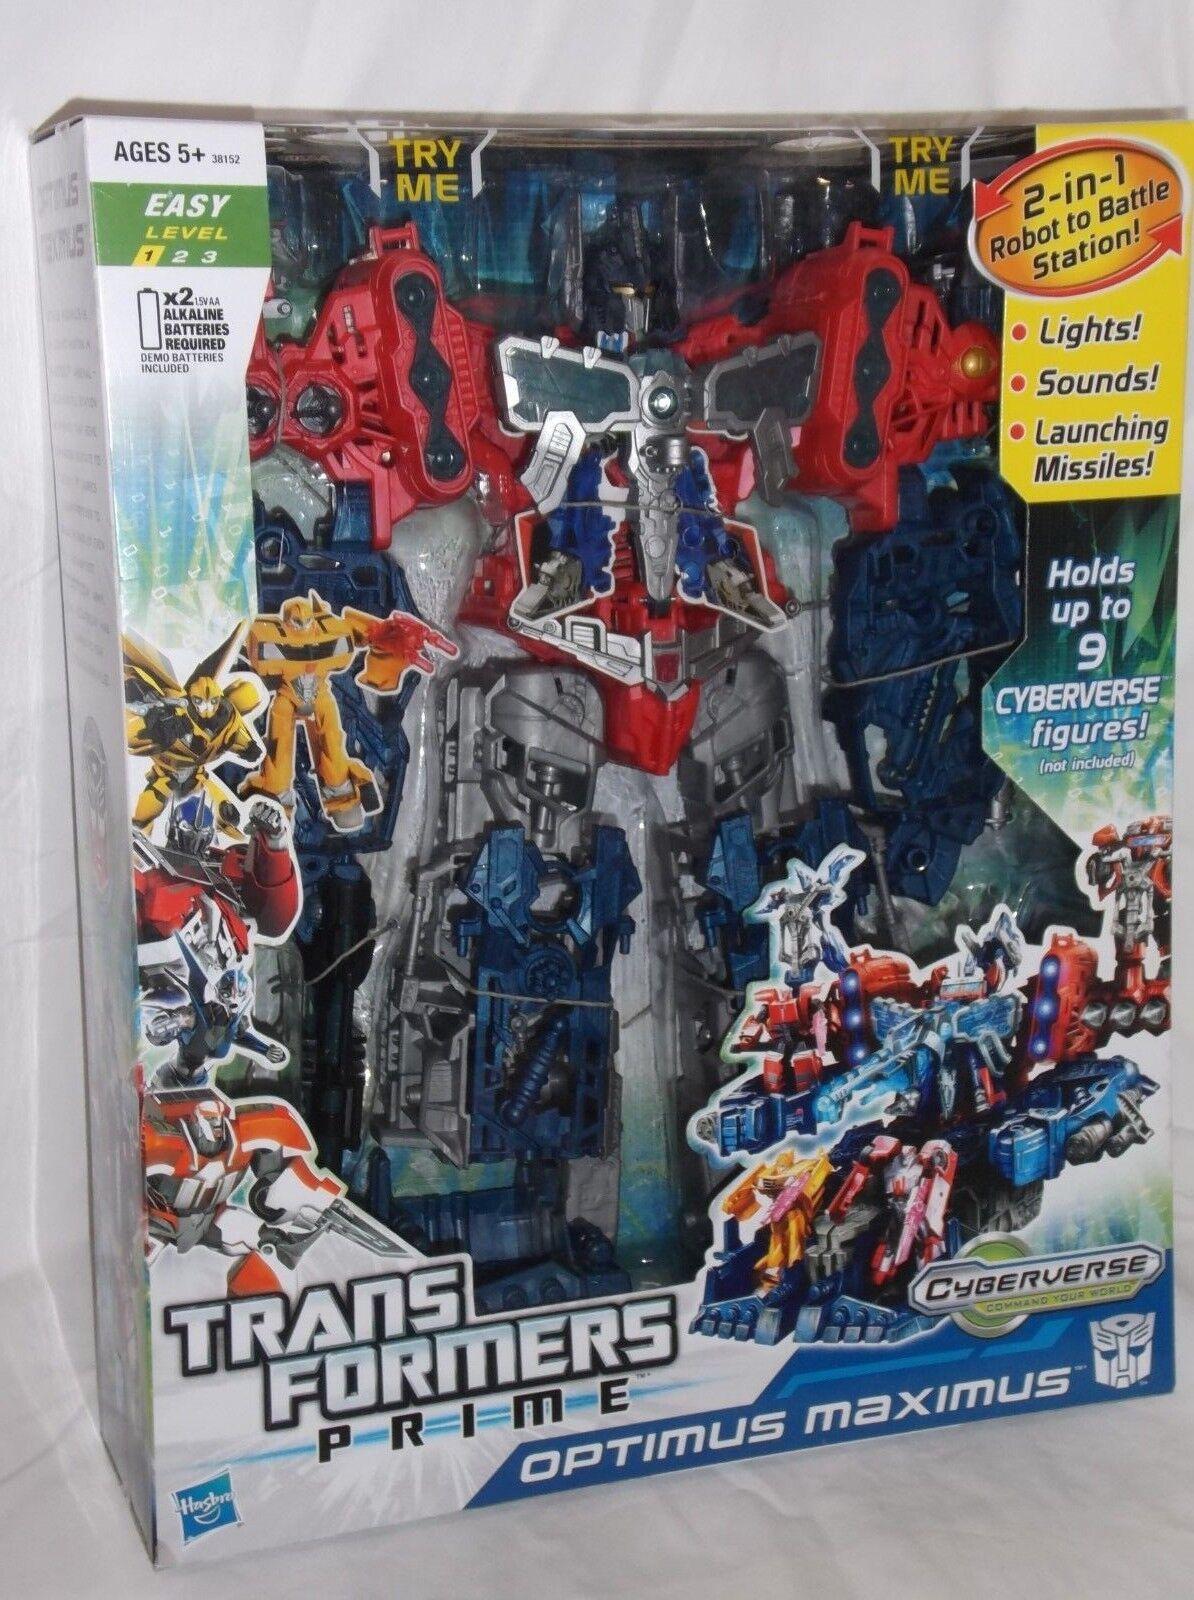 HASBRO Transformers cyberverse Prime Optimus Maximus Lights Sound missiles Robot